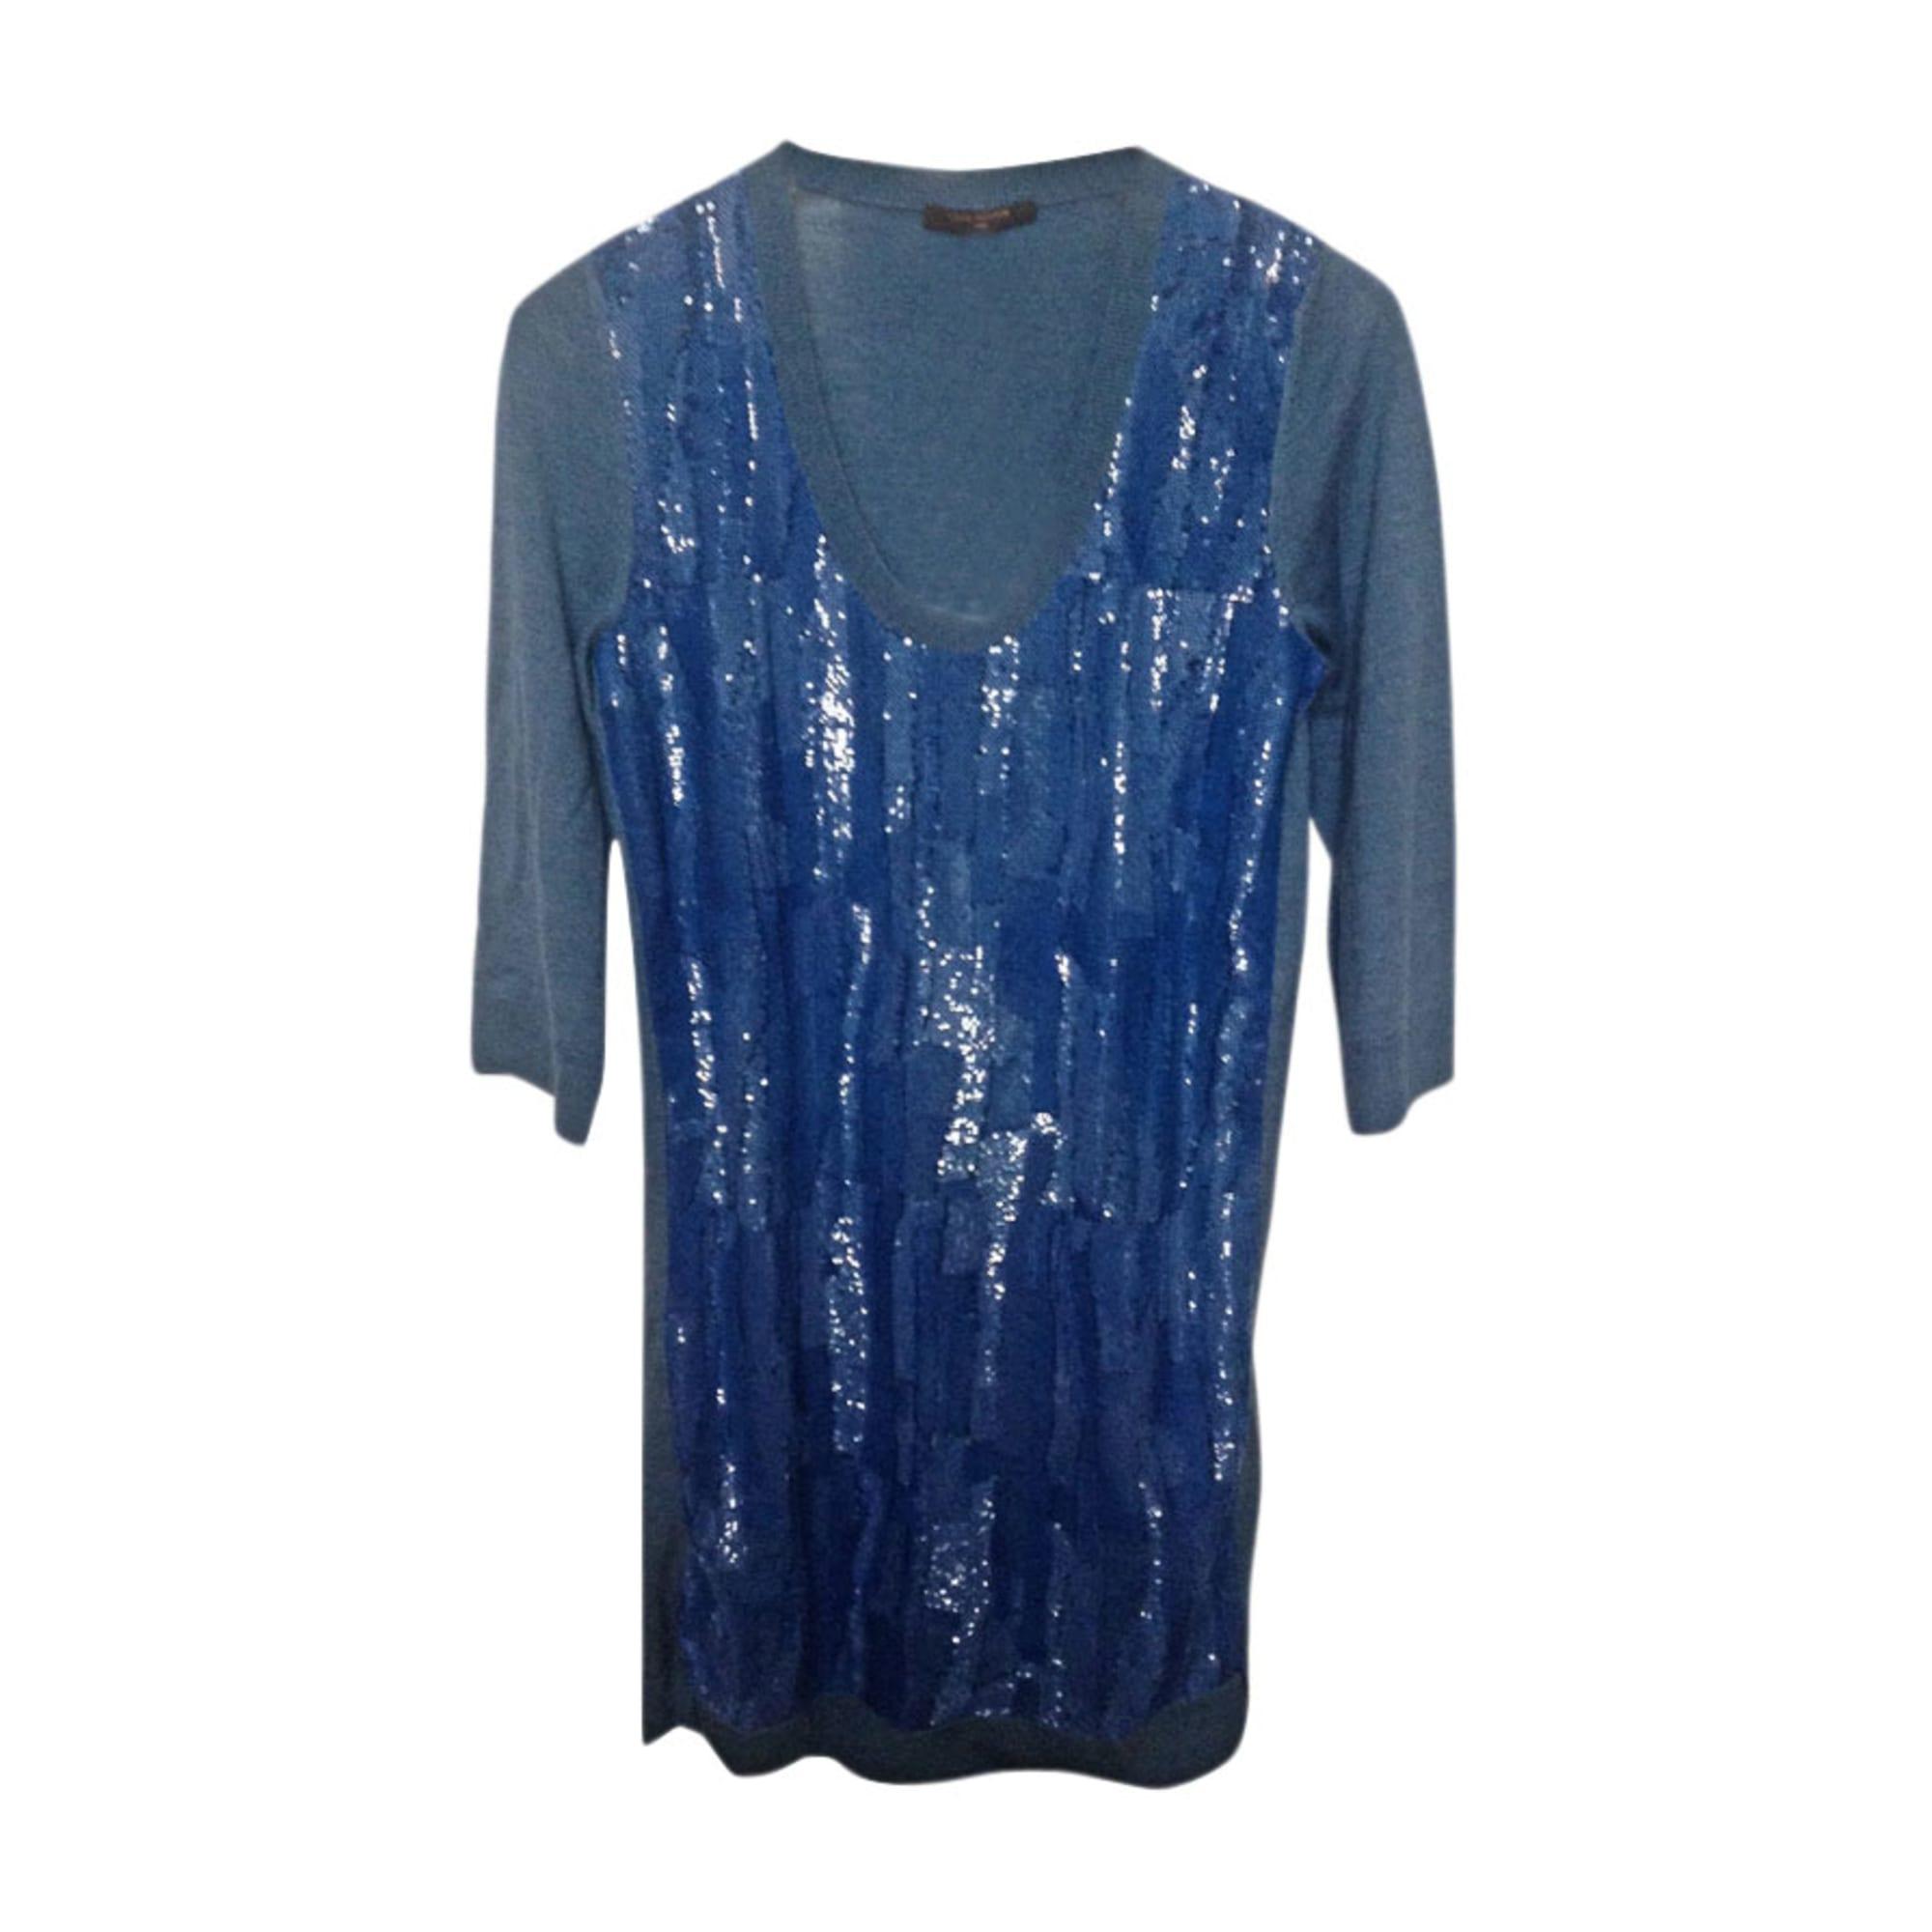 Pull tunique LOUIS VUITTON Bleu, bleu marine, bleu turquoise